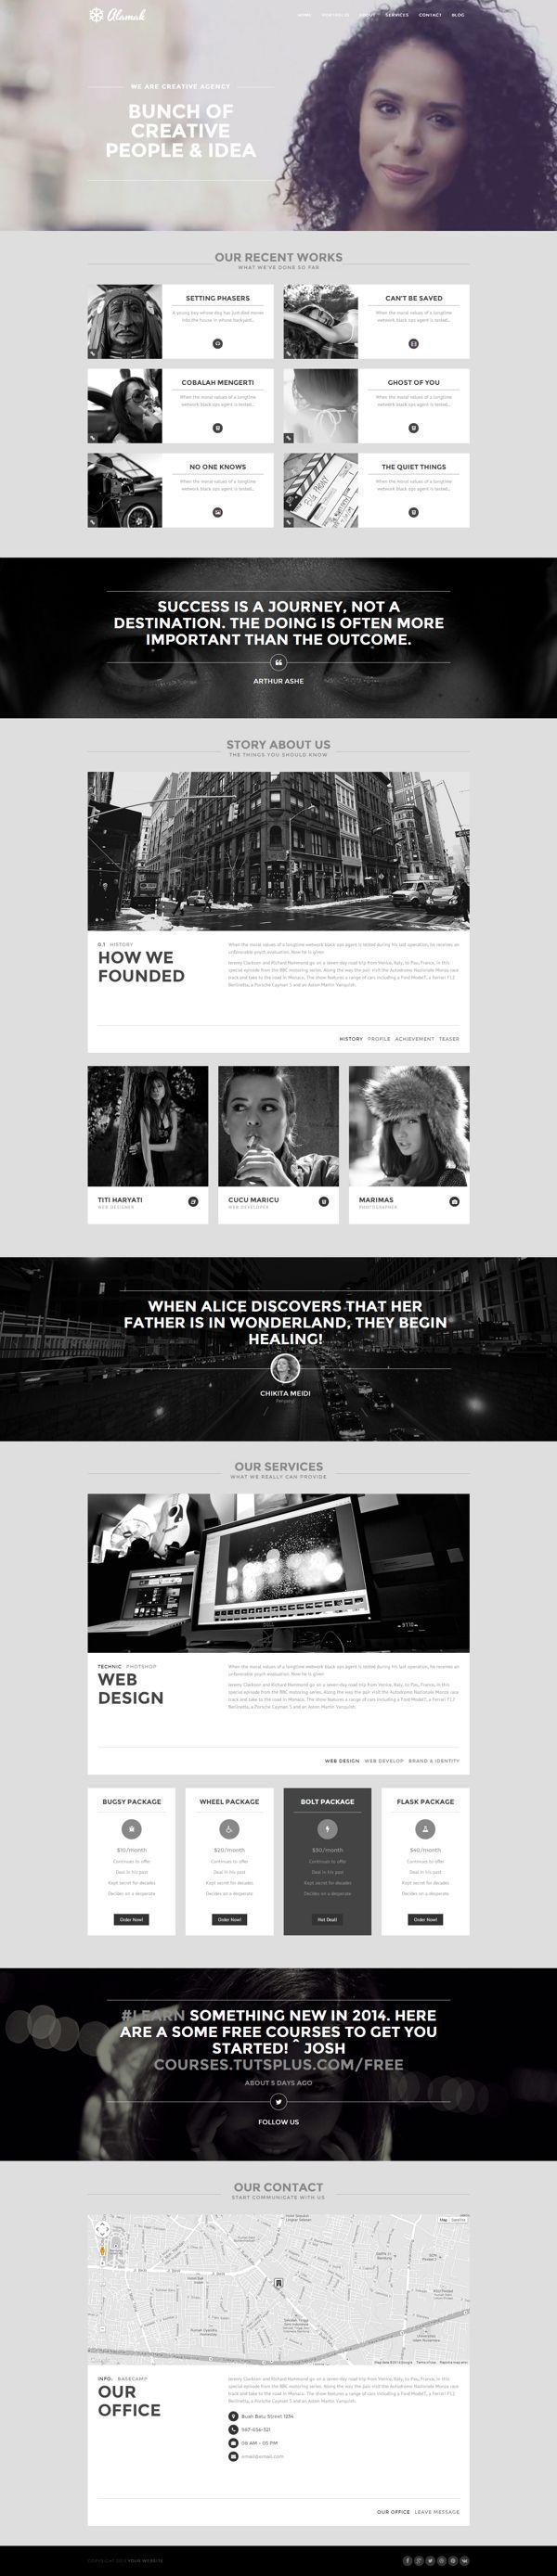 Alamak - Responsive One Page Portfolio Theme by Zizaza - design ocean , via Behance